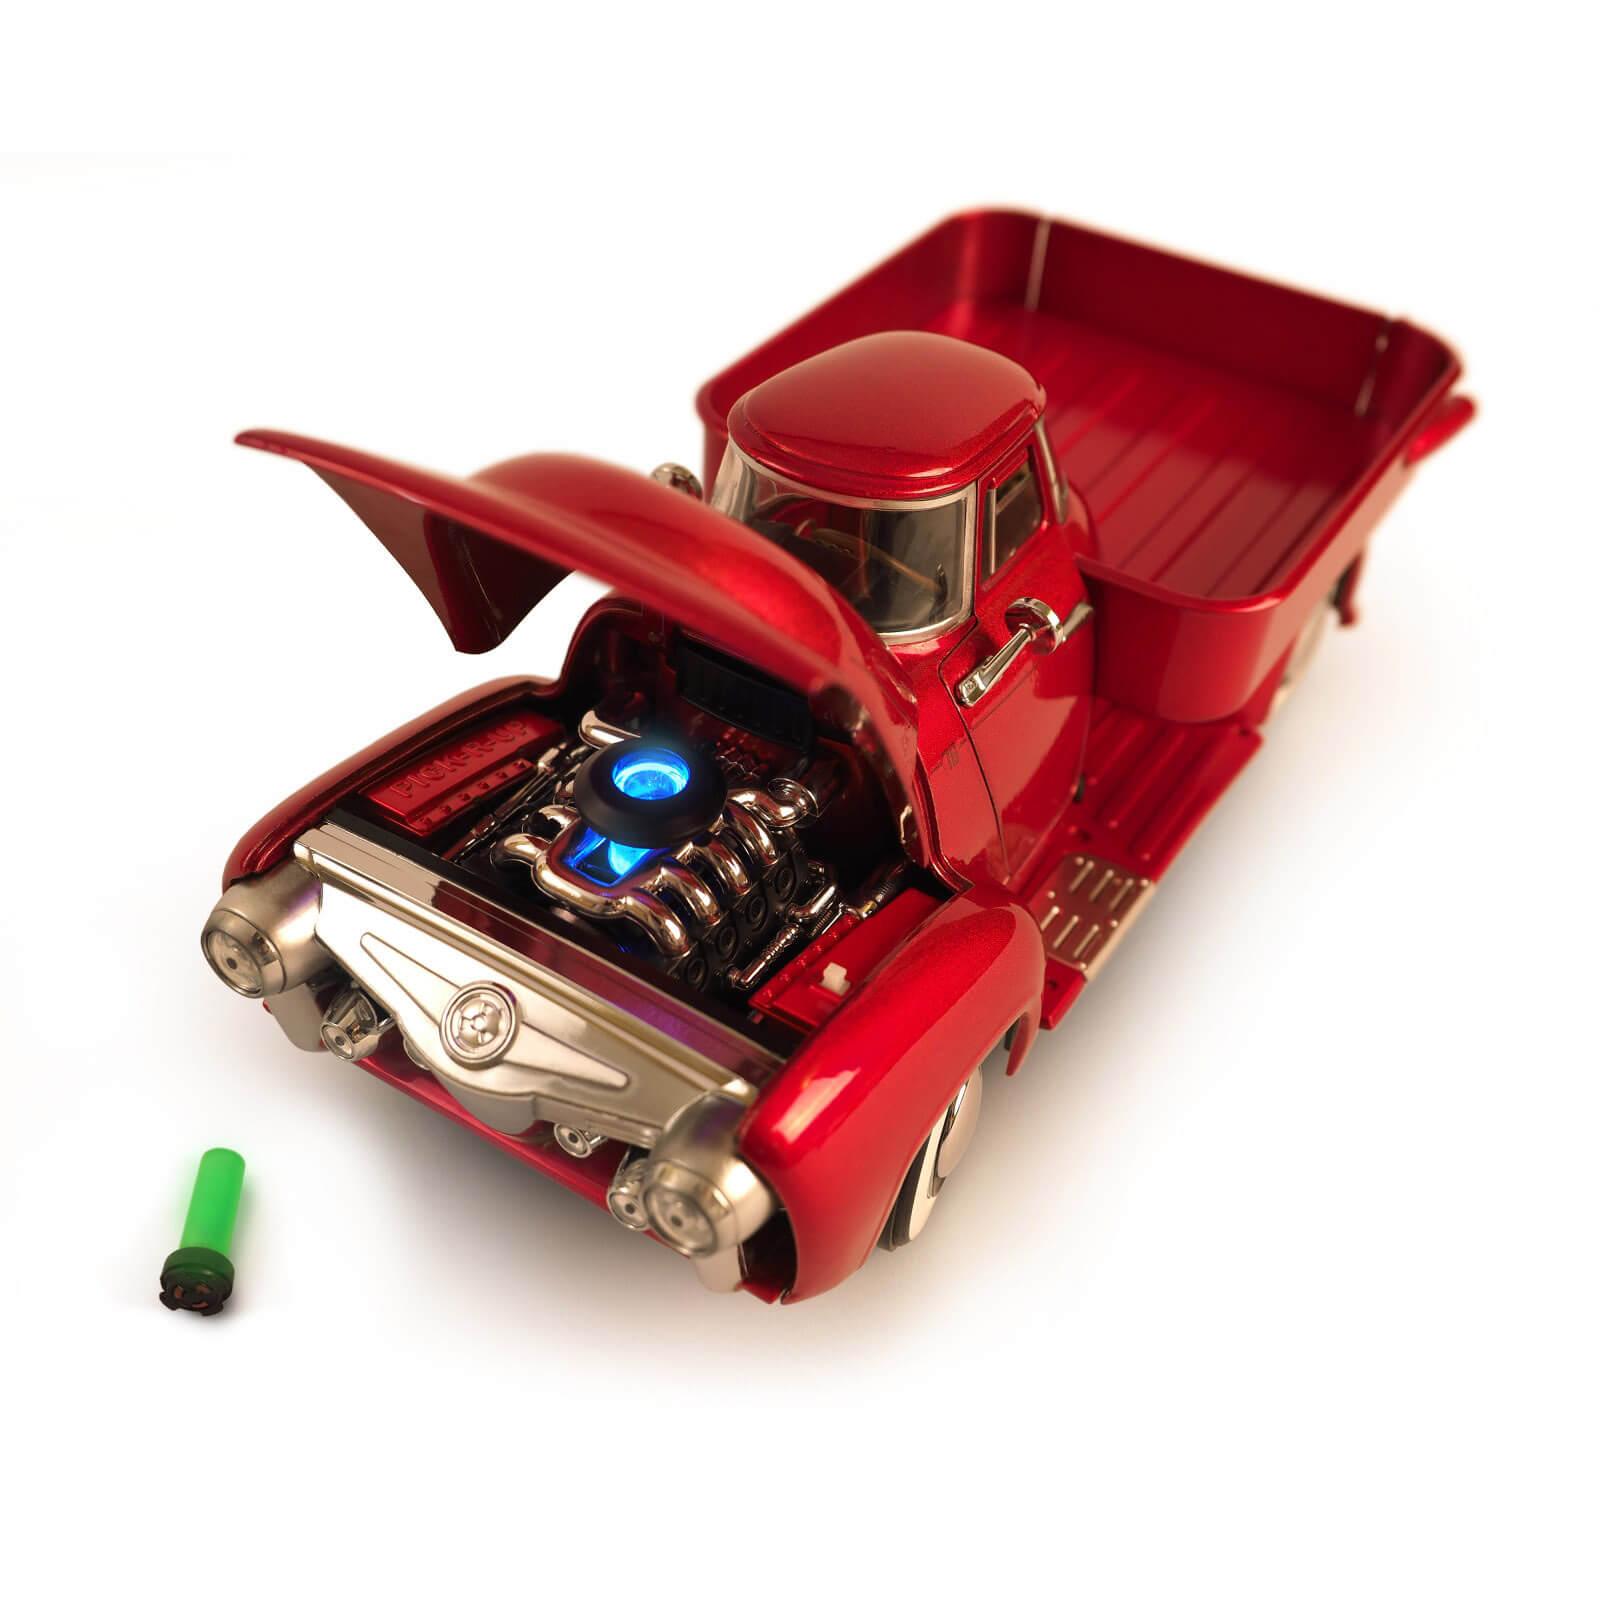 The Wand Company Chryslus Pick-R-Up (1:18 Druckguss-Modellauto aus Fallout, Metallic-Lack, Chrom-Applikationen, leuchtender Motorkern)